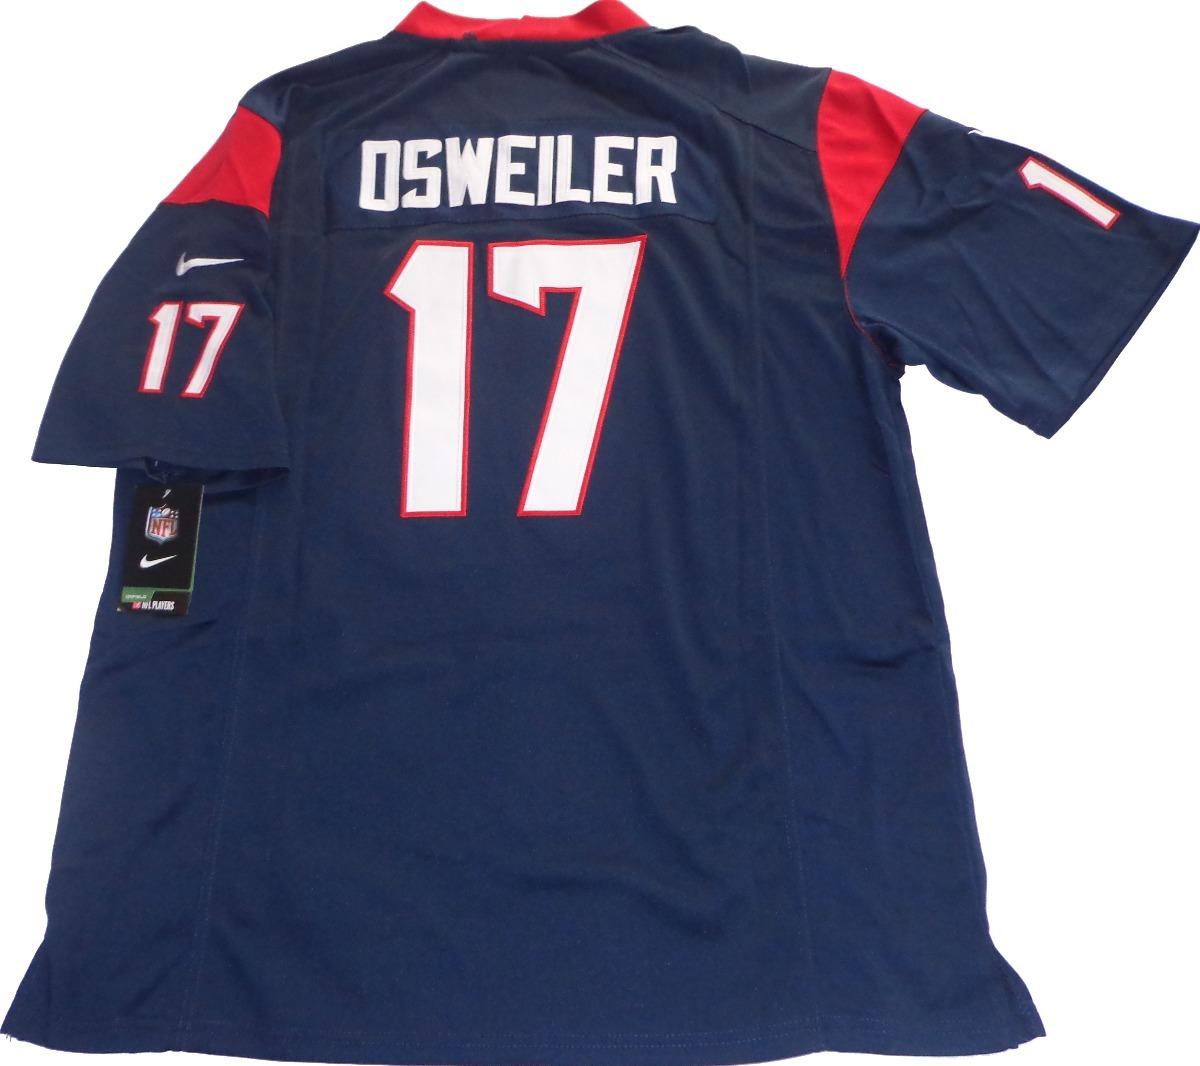 87f80255f97b7 camiseta futbol americano houston texans nike xl nfl usa 17. Cargando zoom.